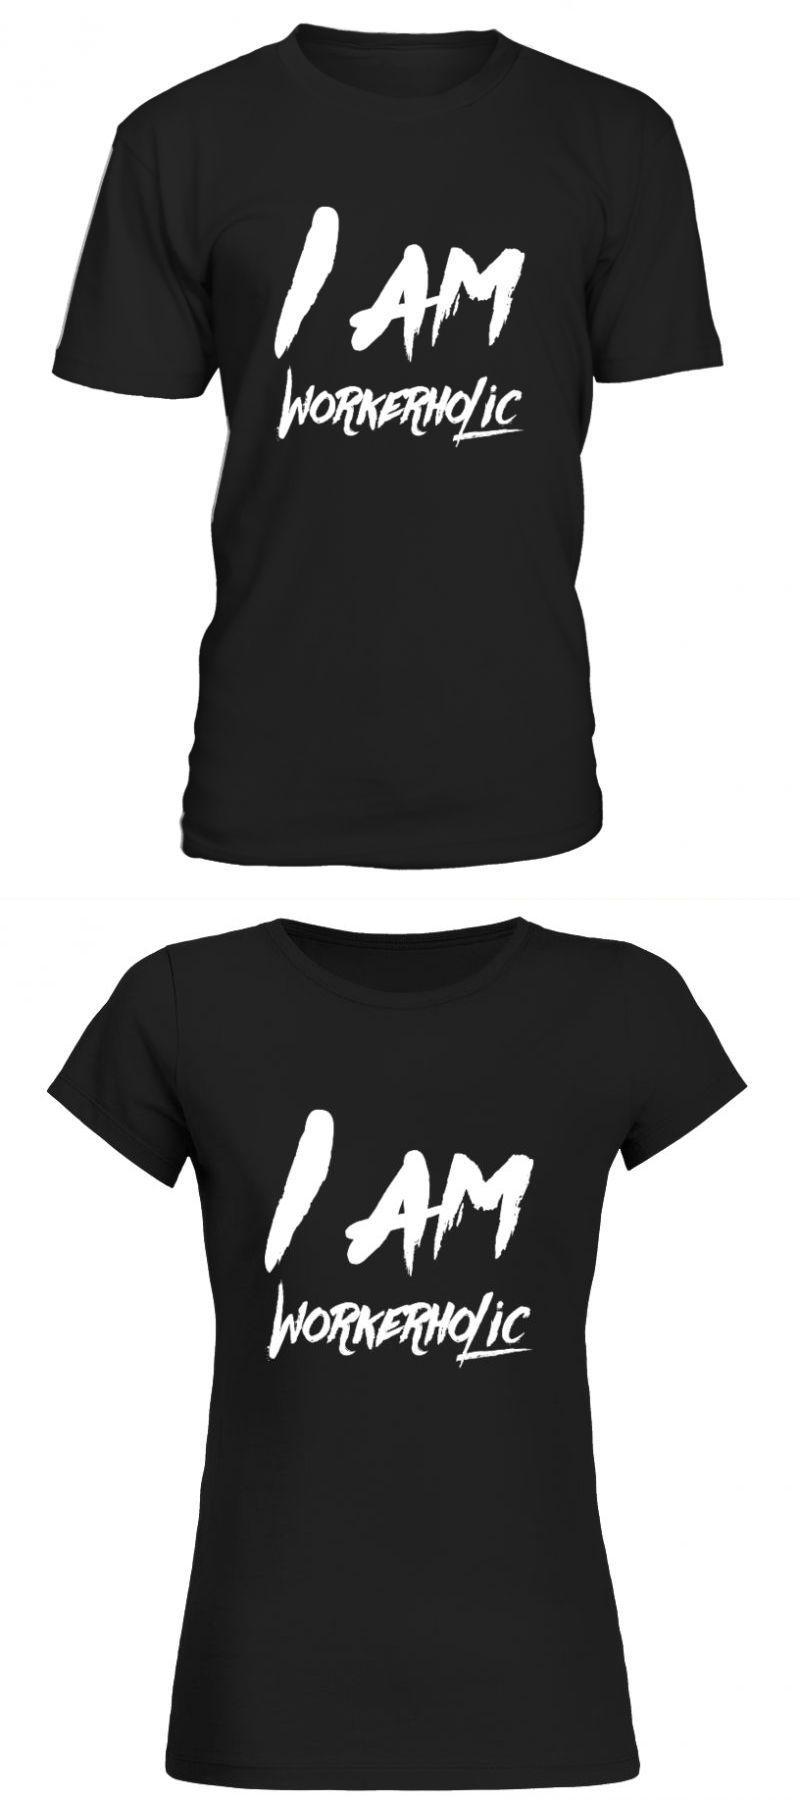 Rf engineer t shirt i am workerholic limited edition